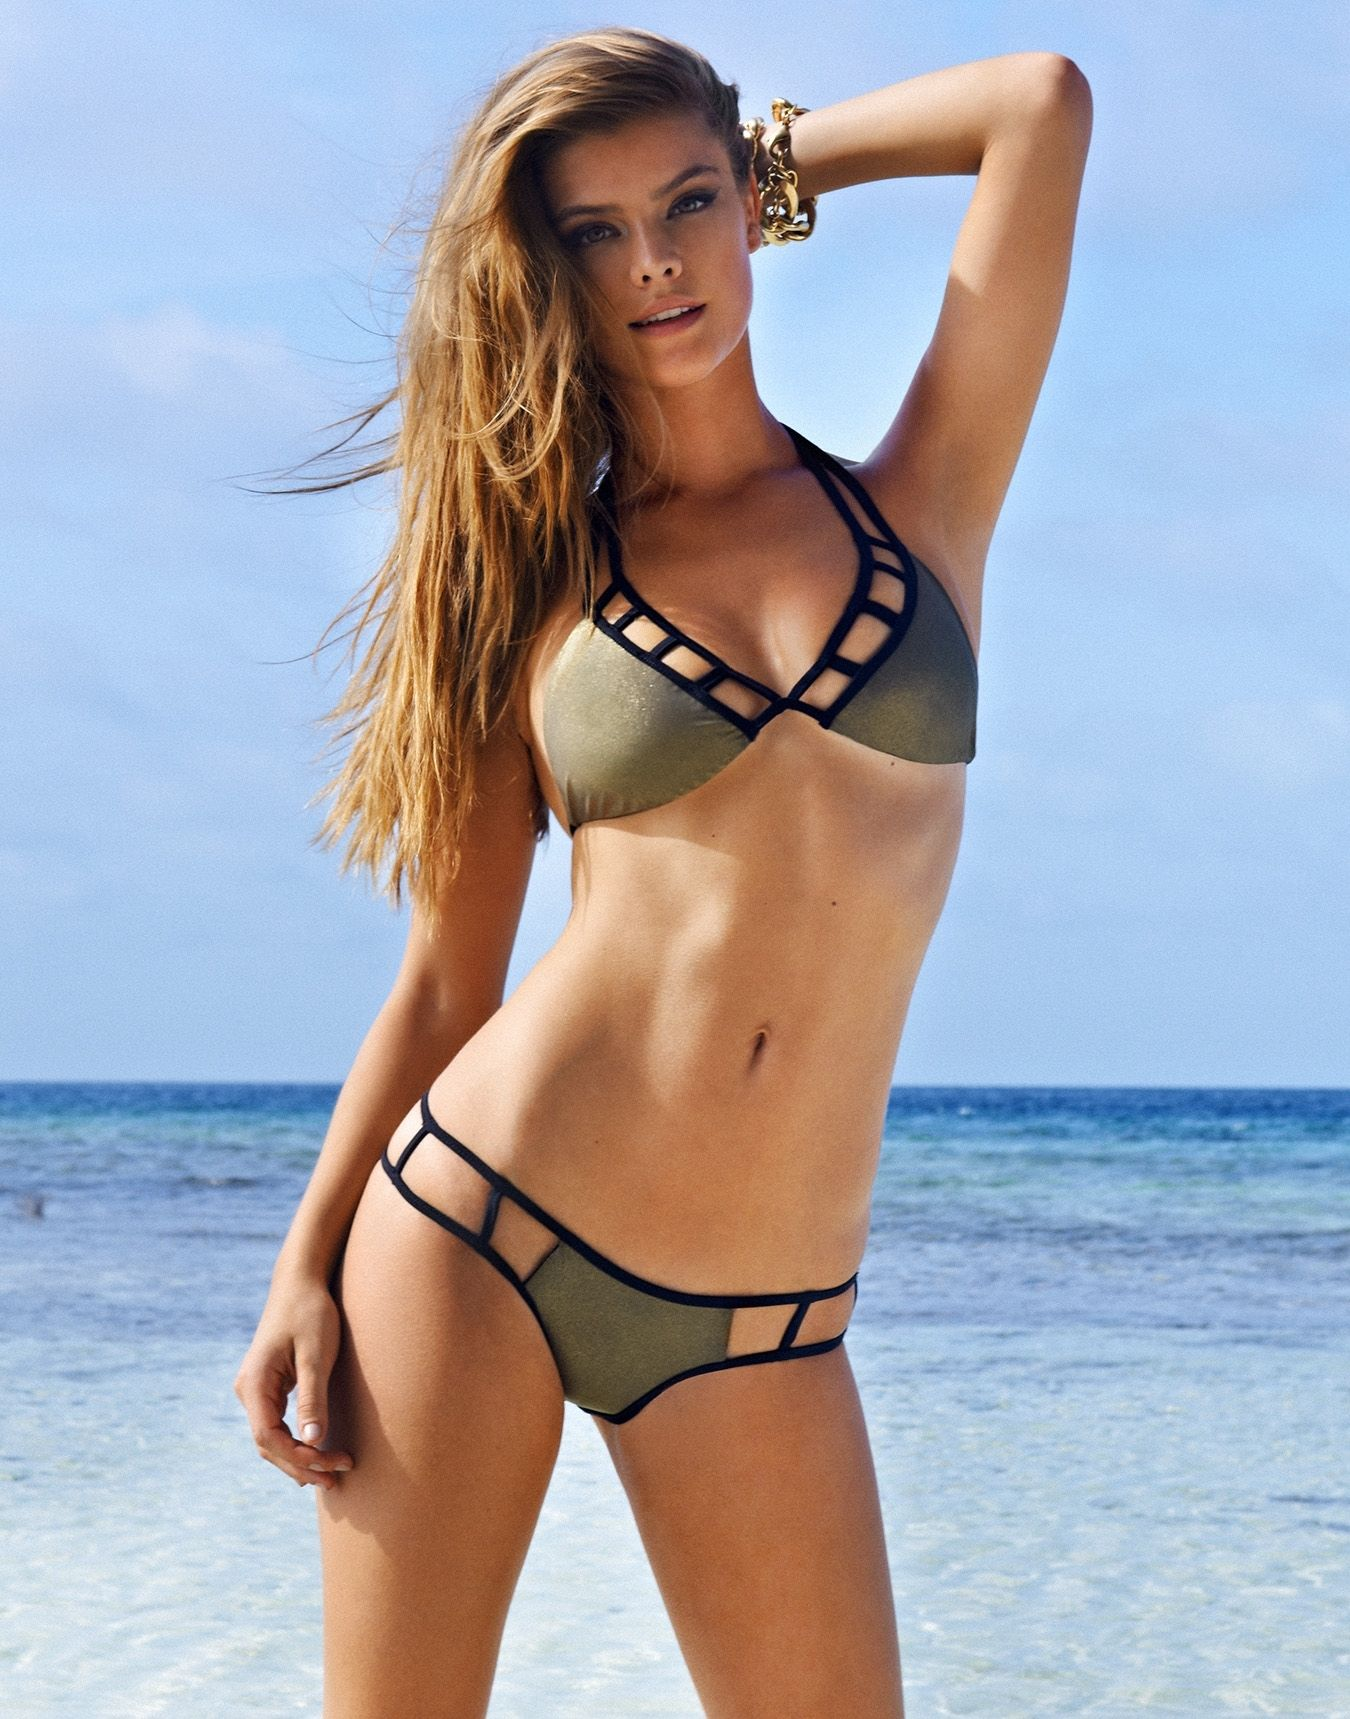 bubble-full-size-girl-bikini-pics-sex-cam